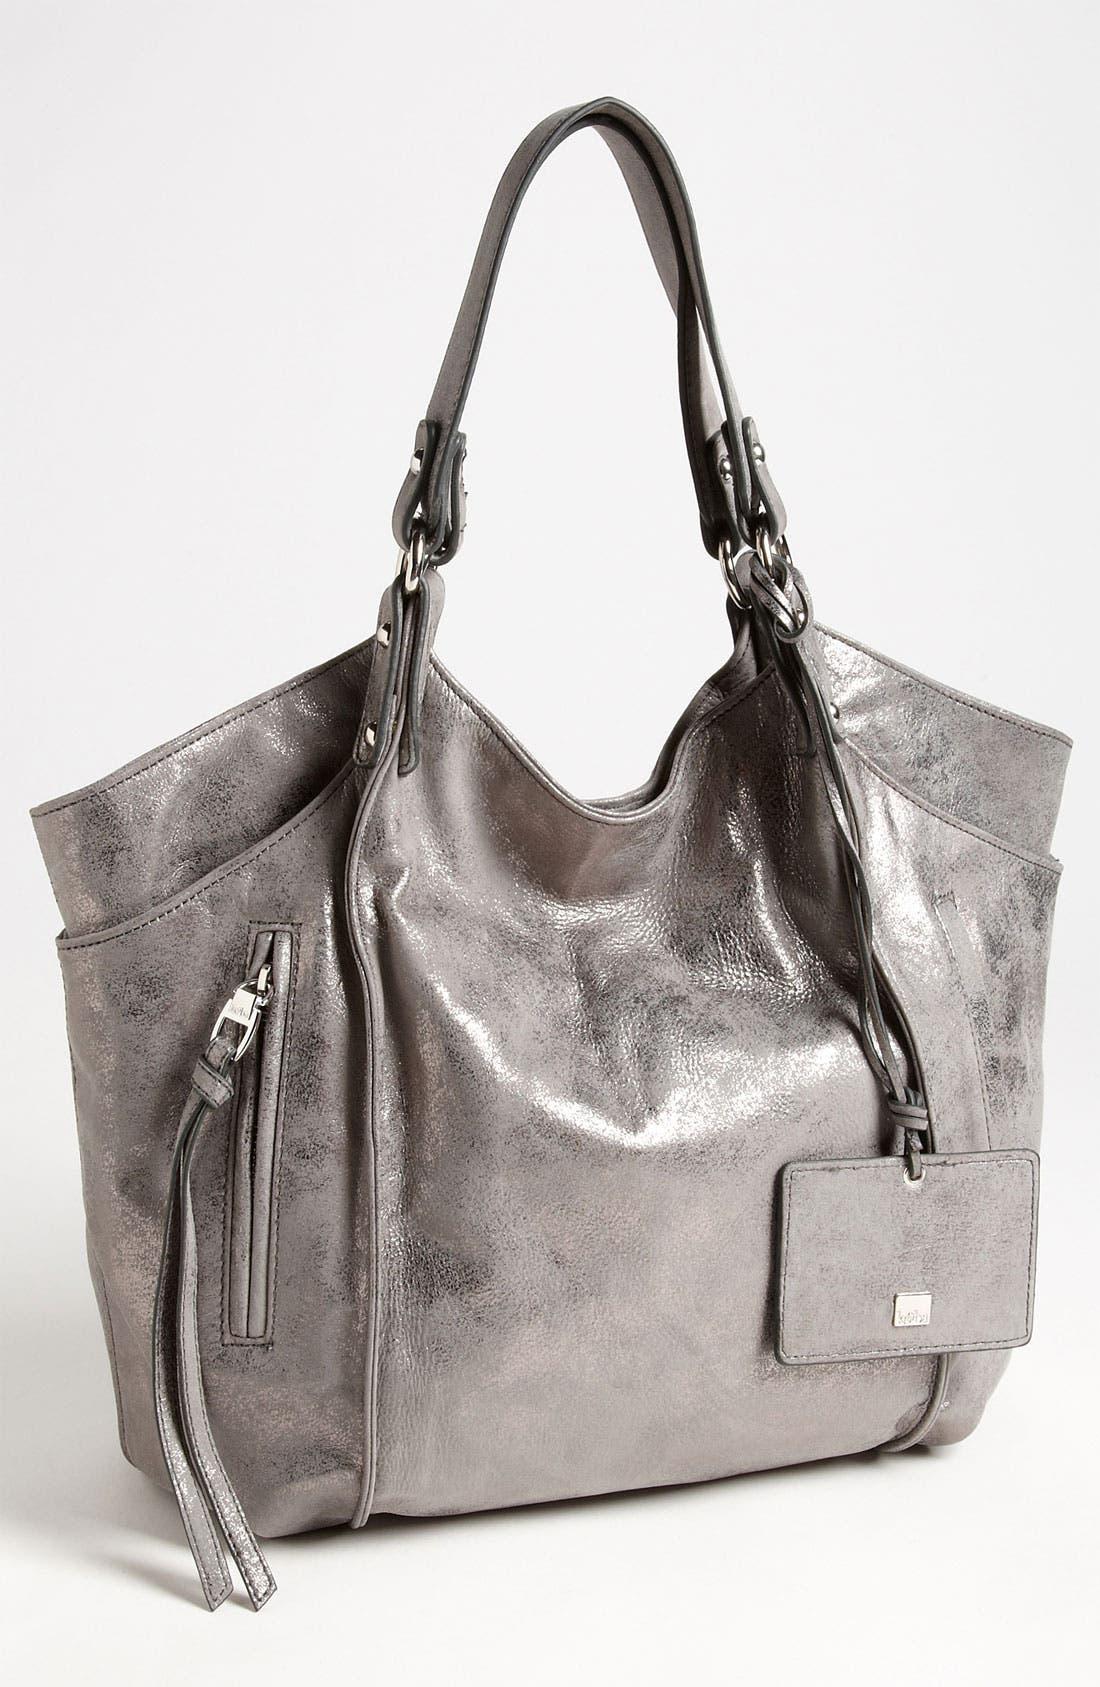 Main Image - Kooba 'Logan' Glitter Leather Tote